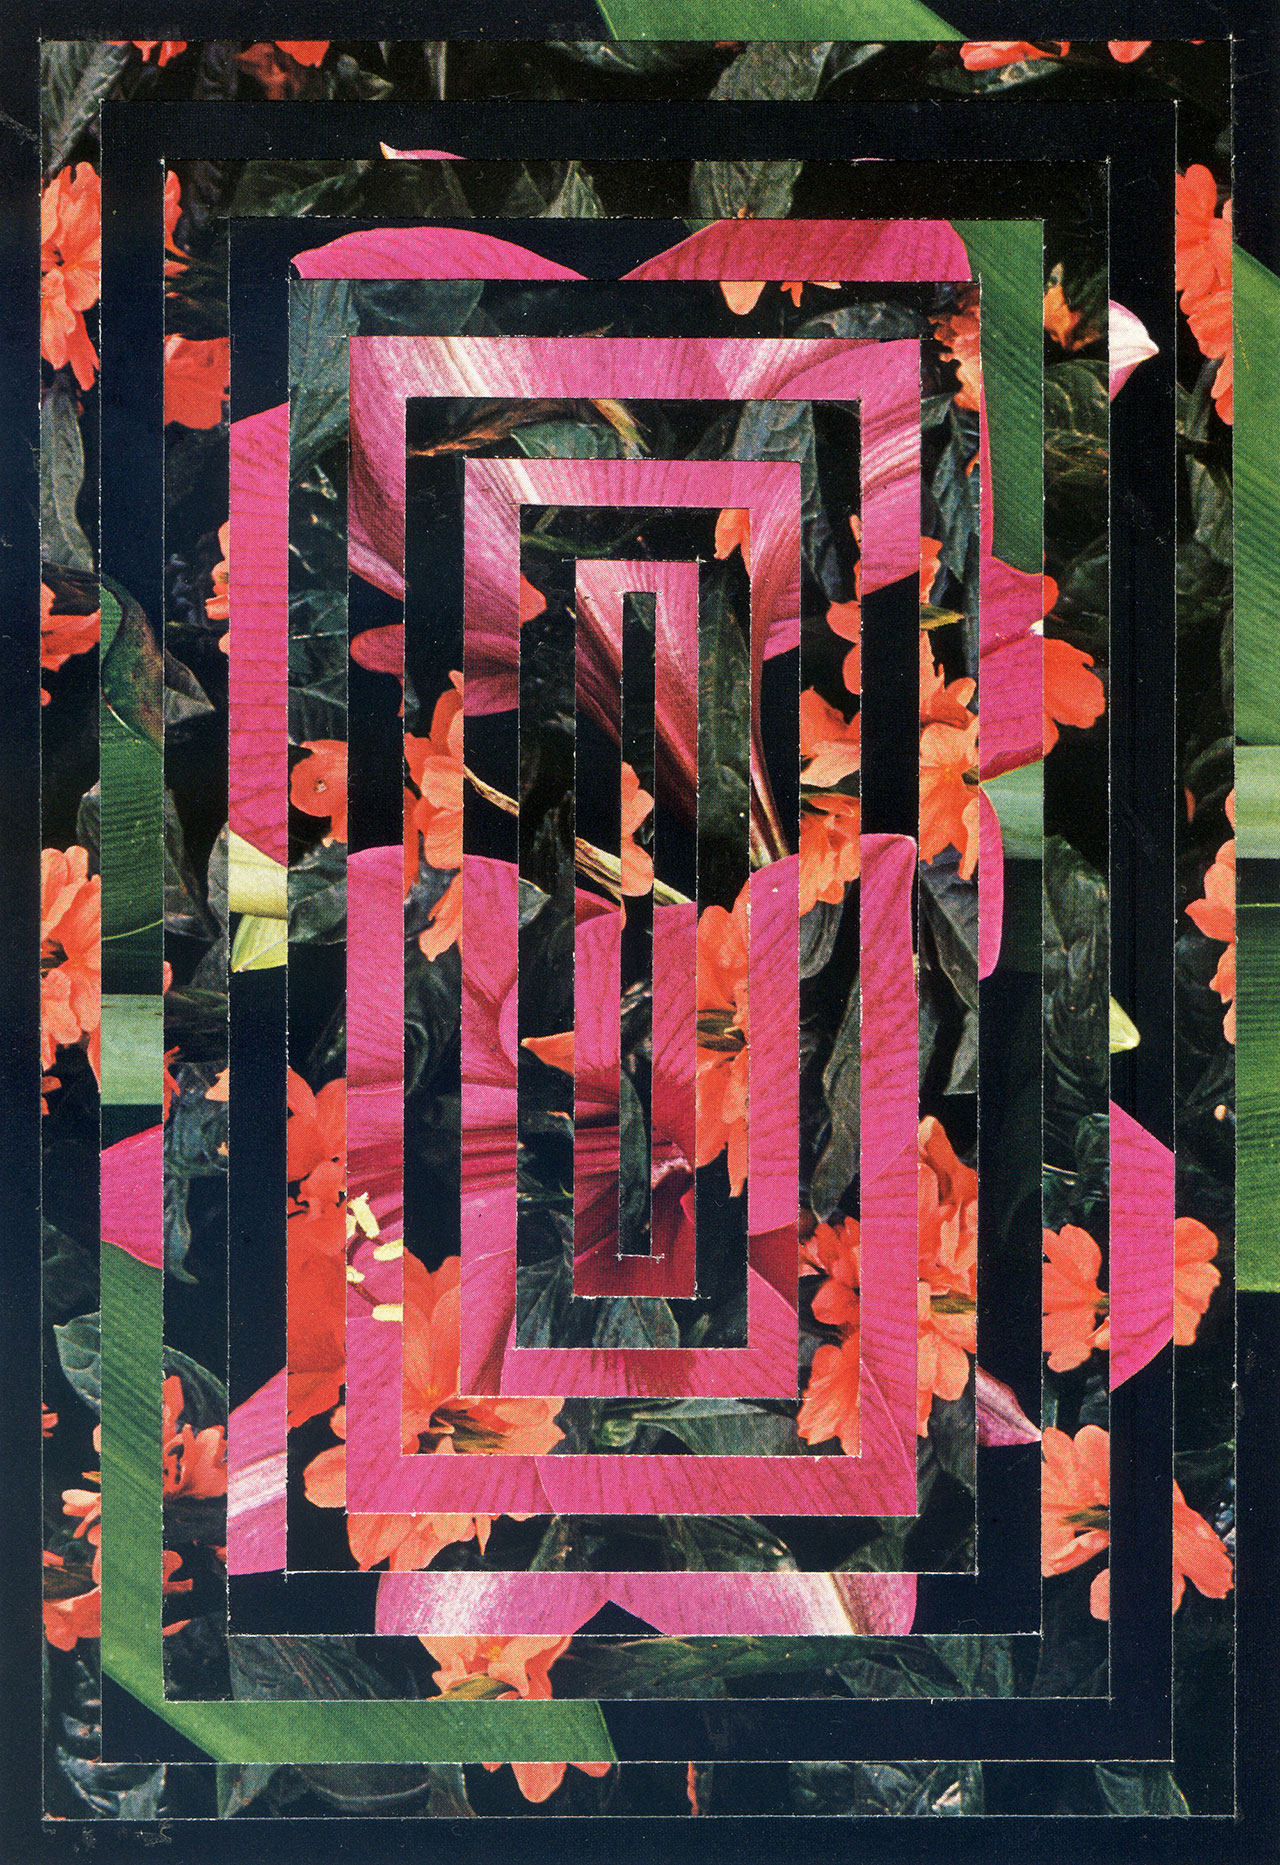 f18_luis_dourado_the_garden_thirdmemory_yatzer.jpg